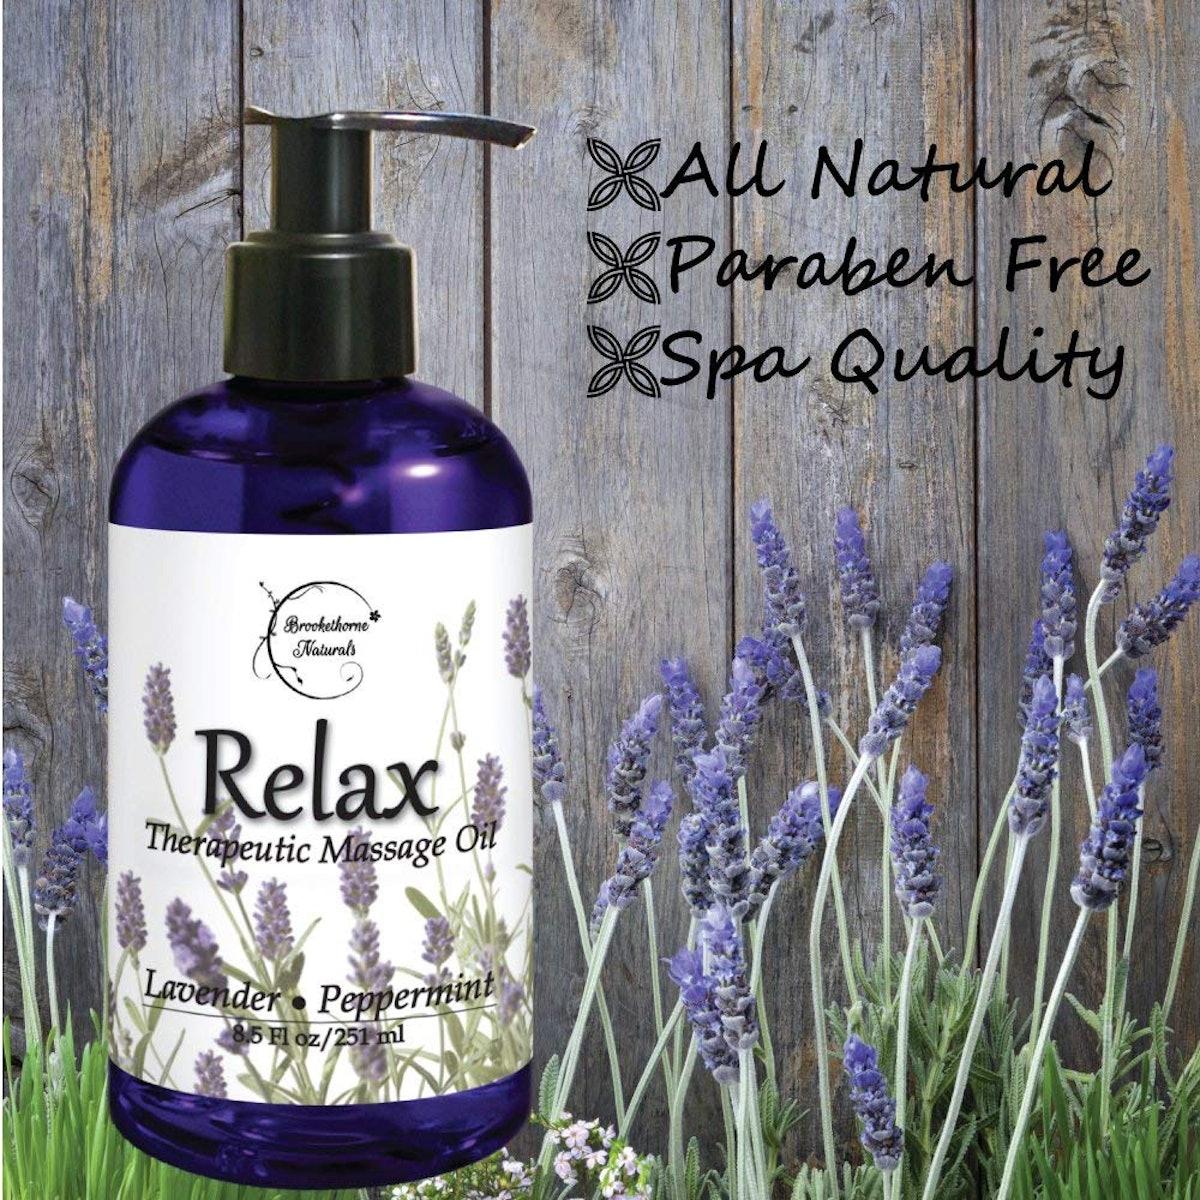 Brookethorne Naturals Body Massage Oil